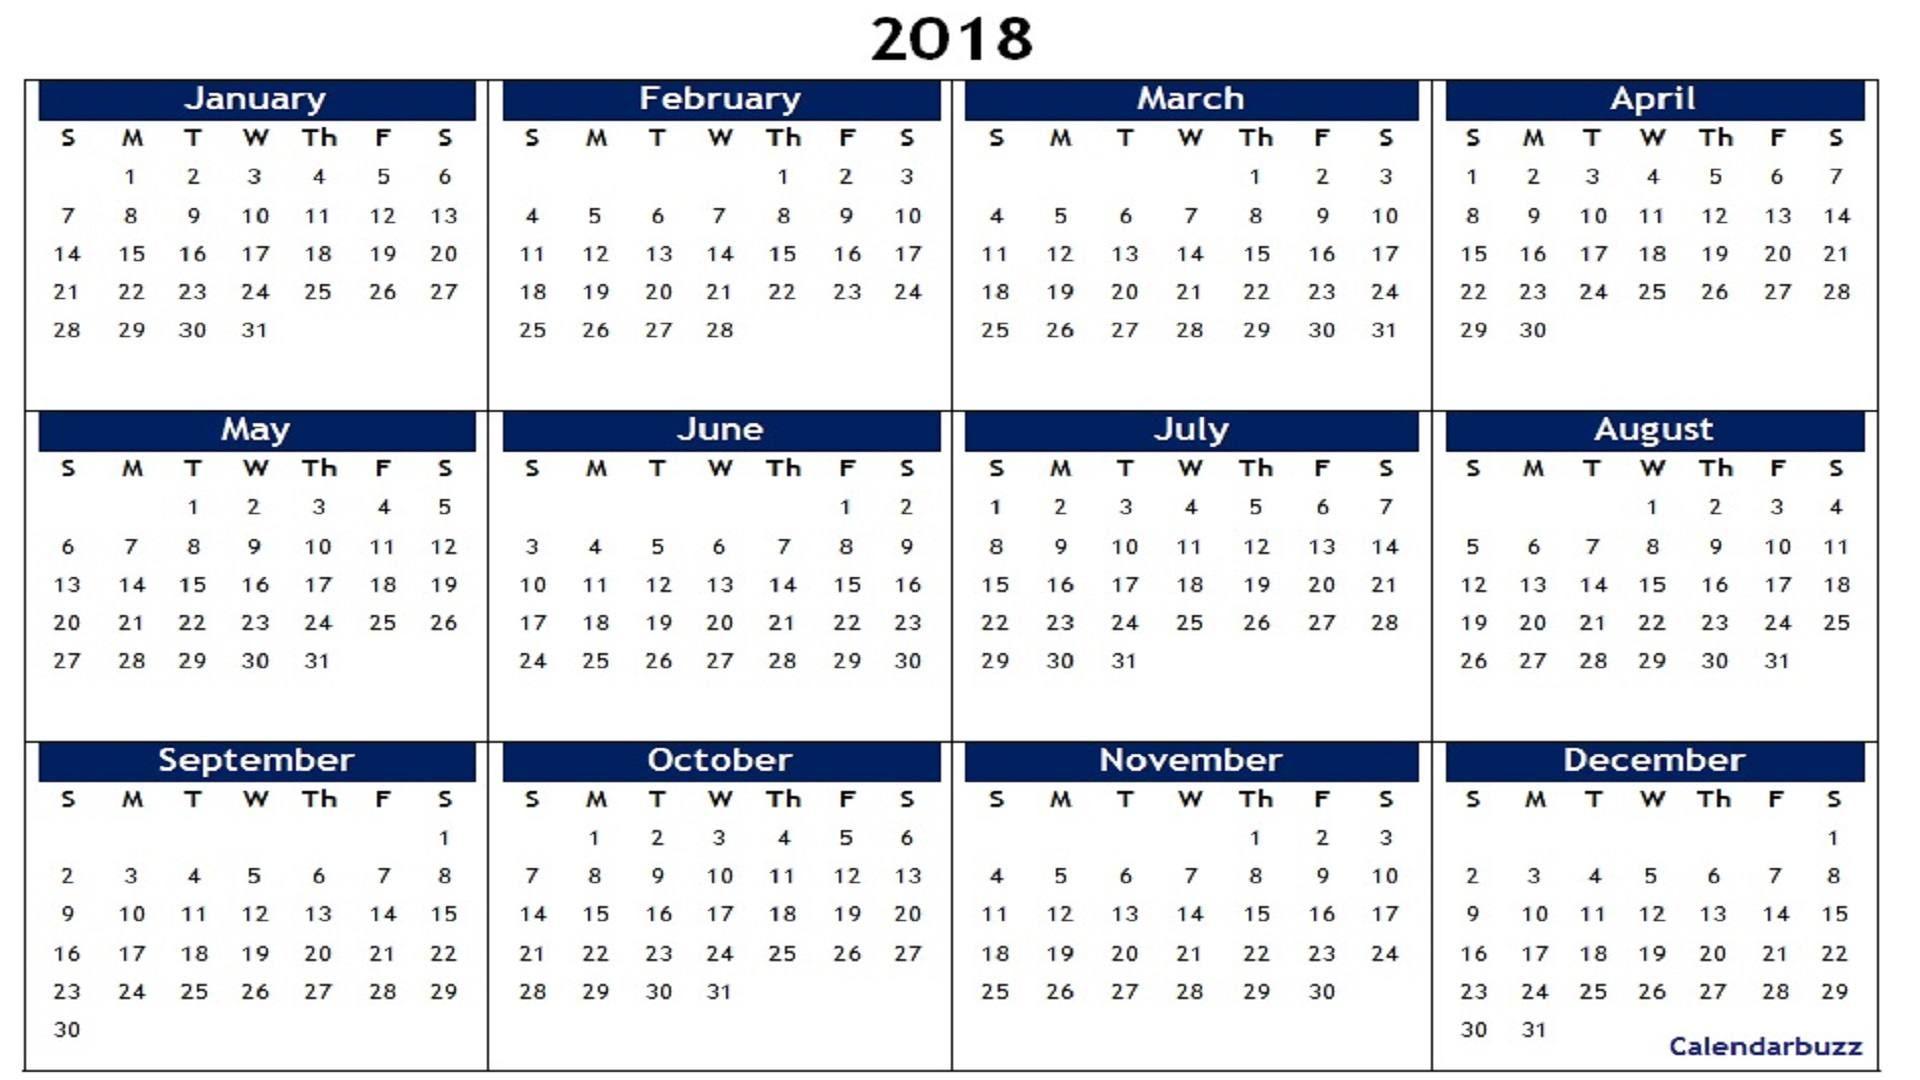 2018 Yearly Calendar Printable Calendar Printables